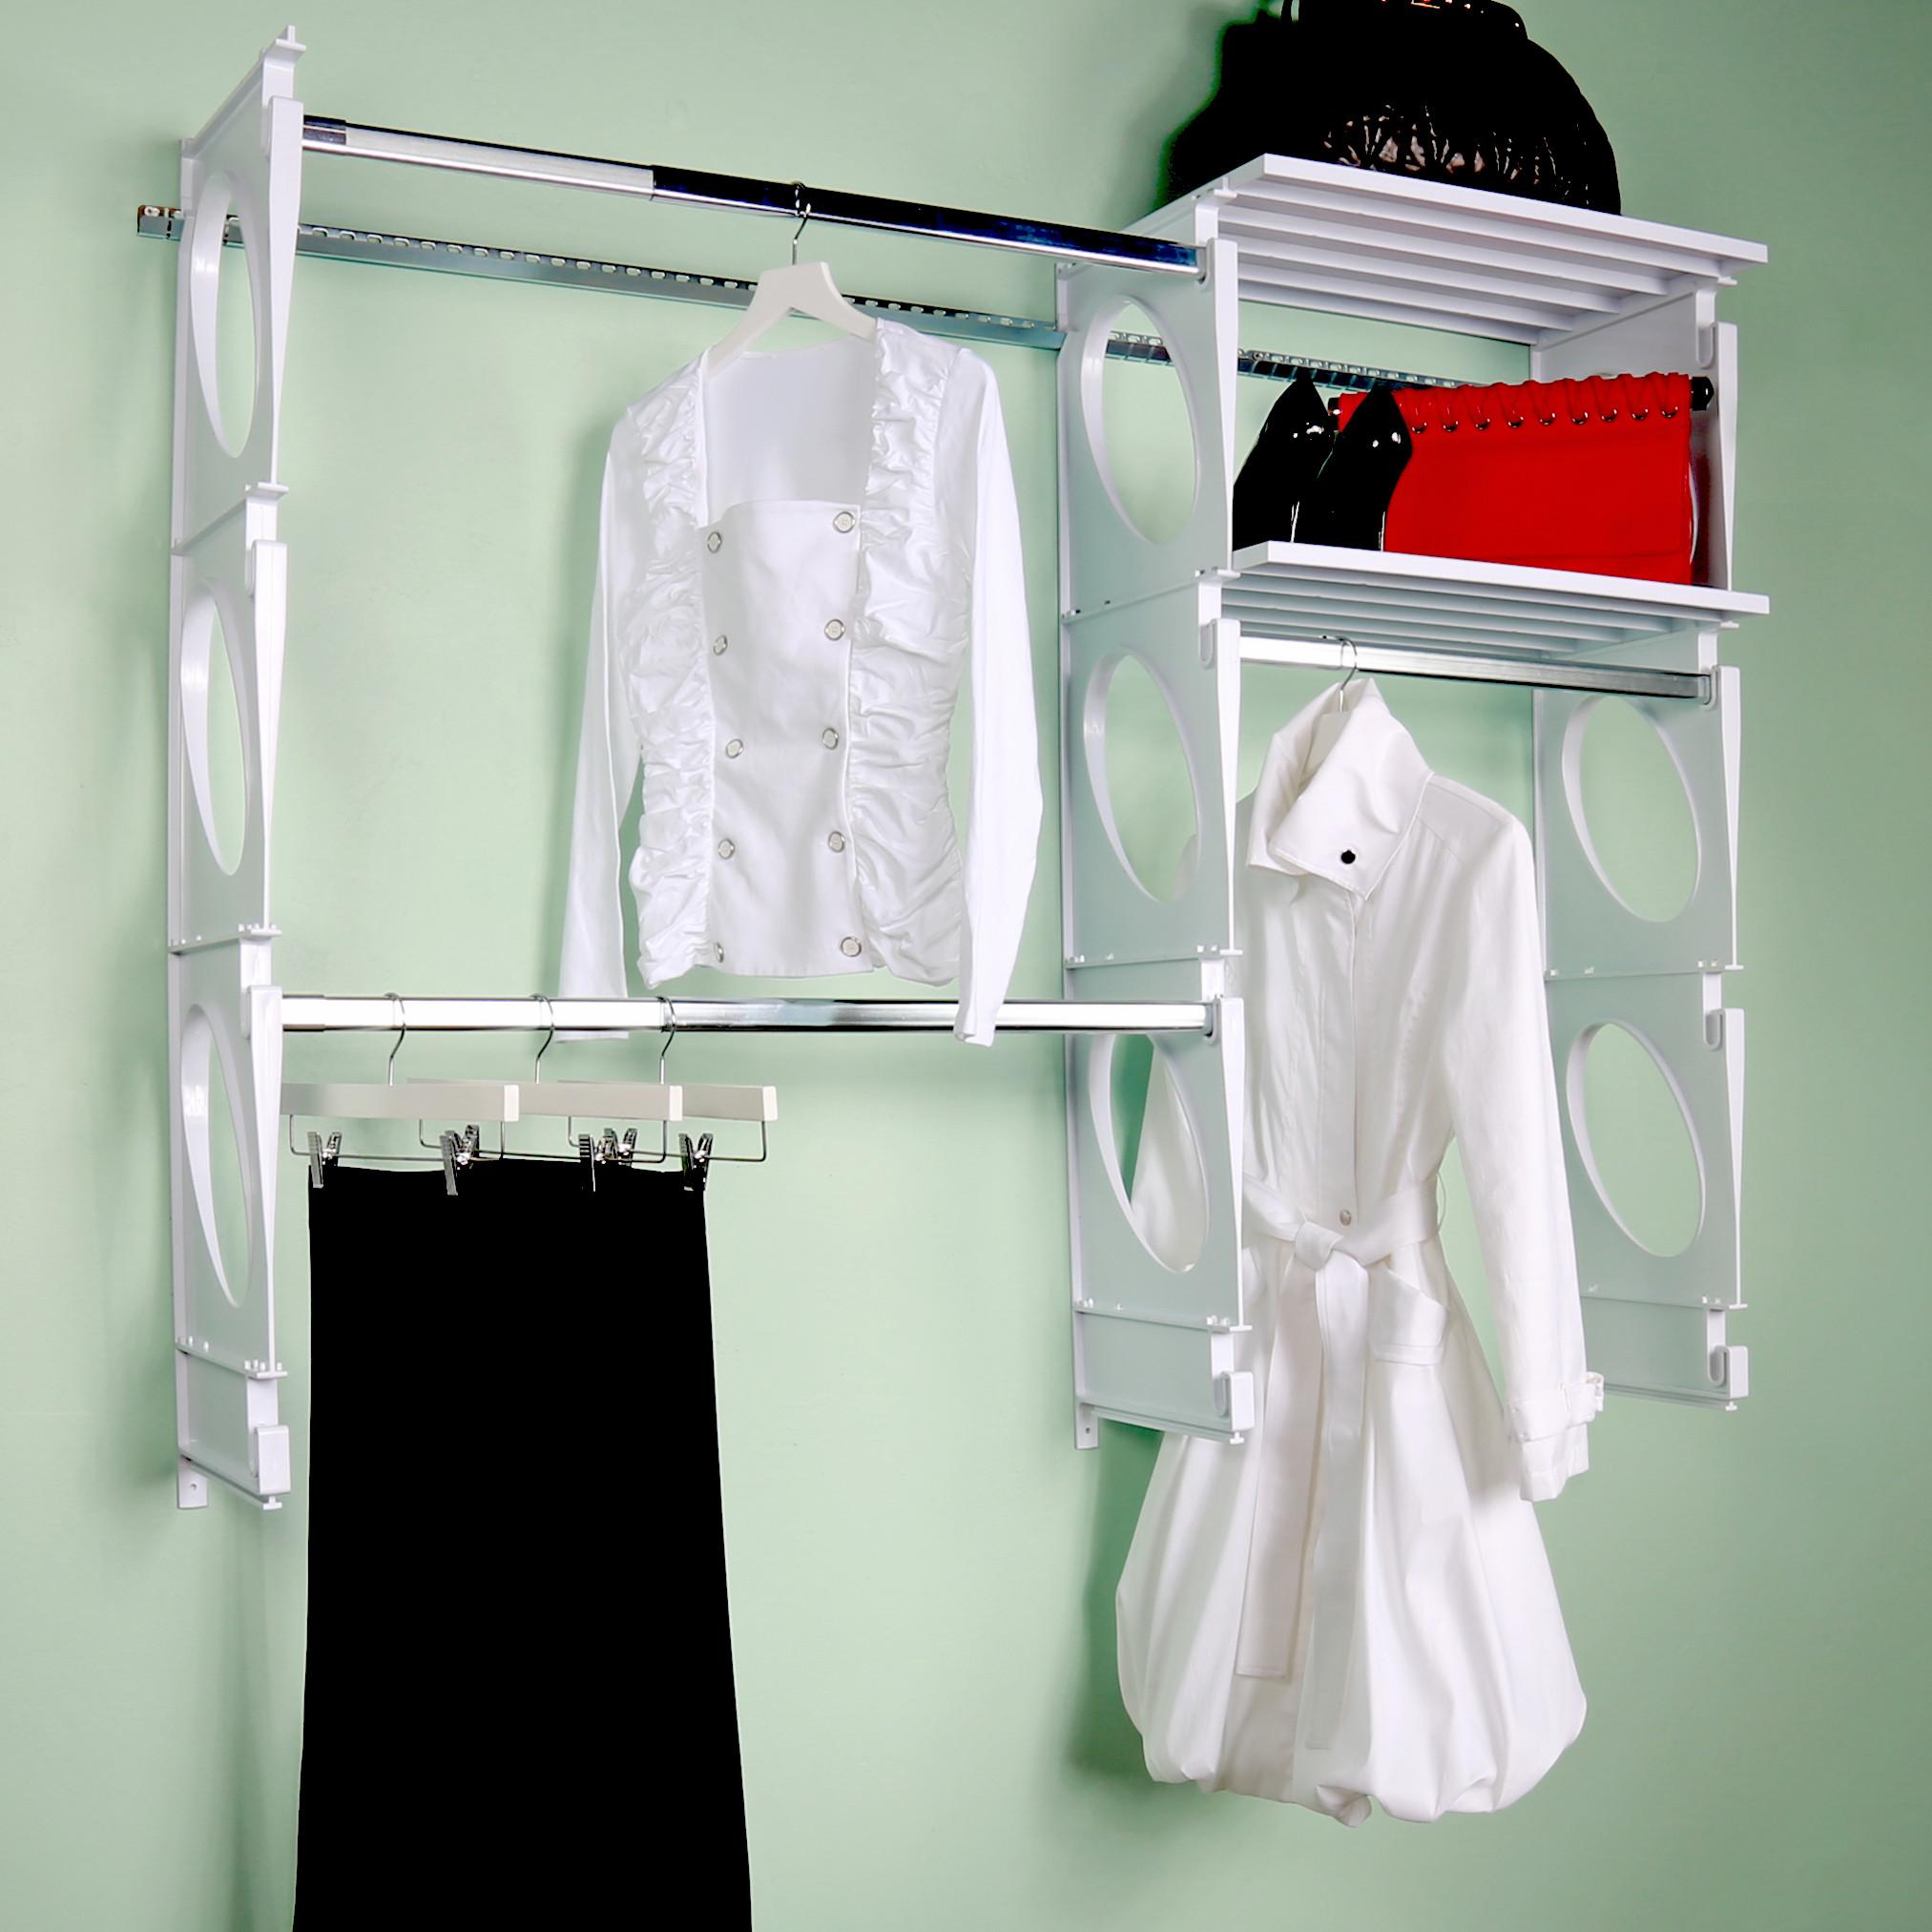 100 4 foot closet organizer decorative storage boxes fabric